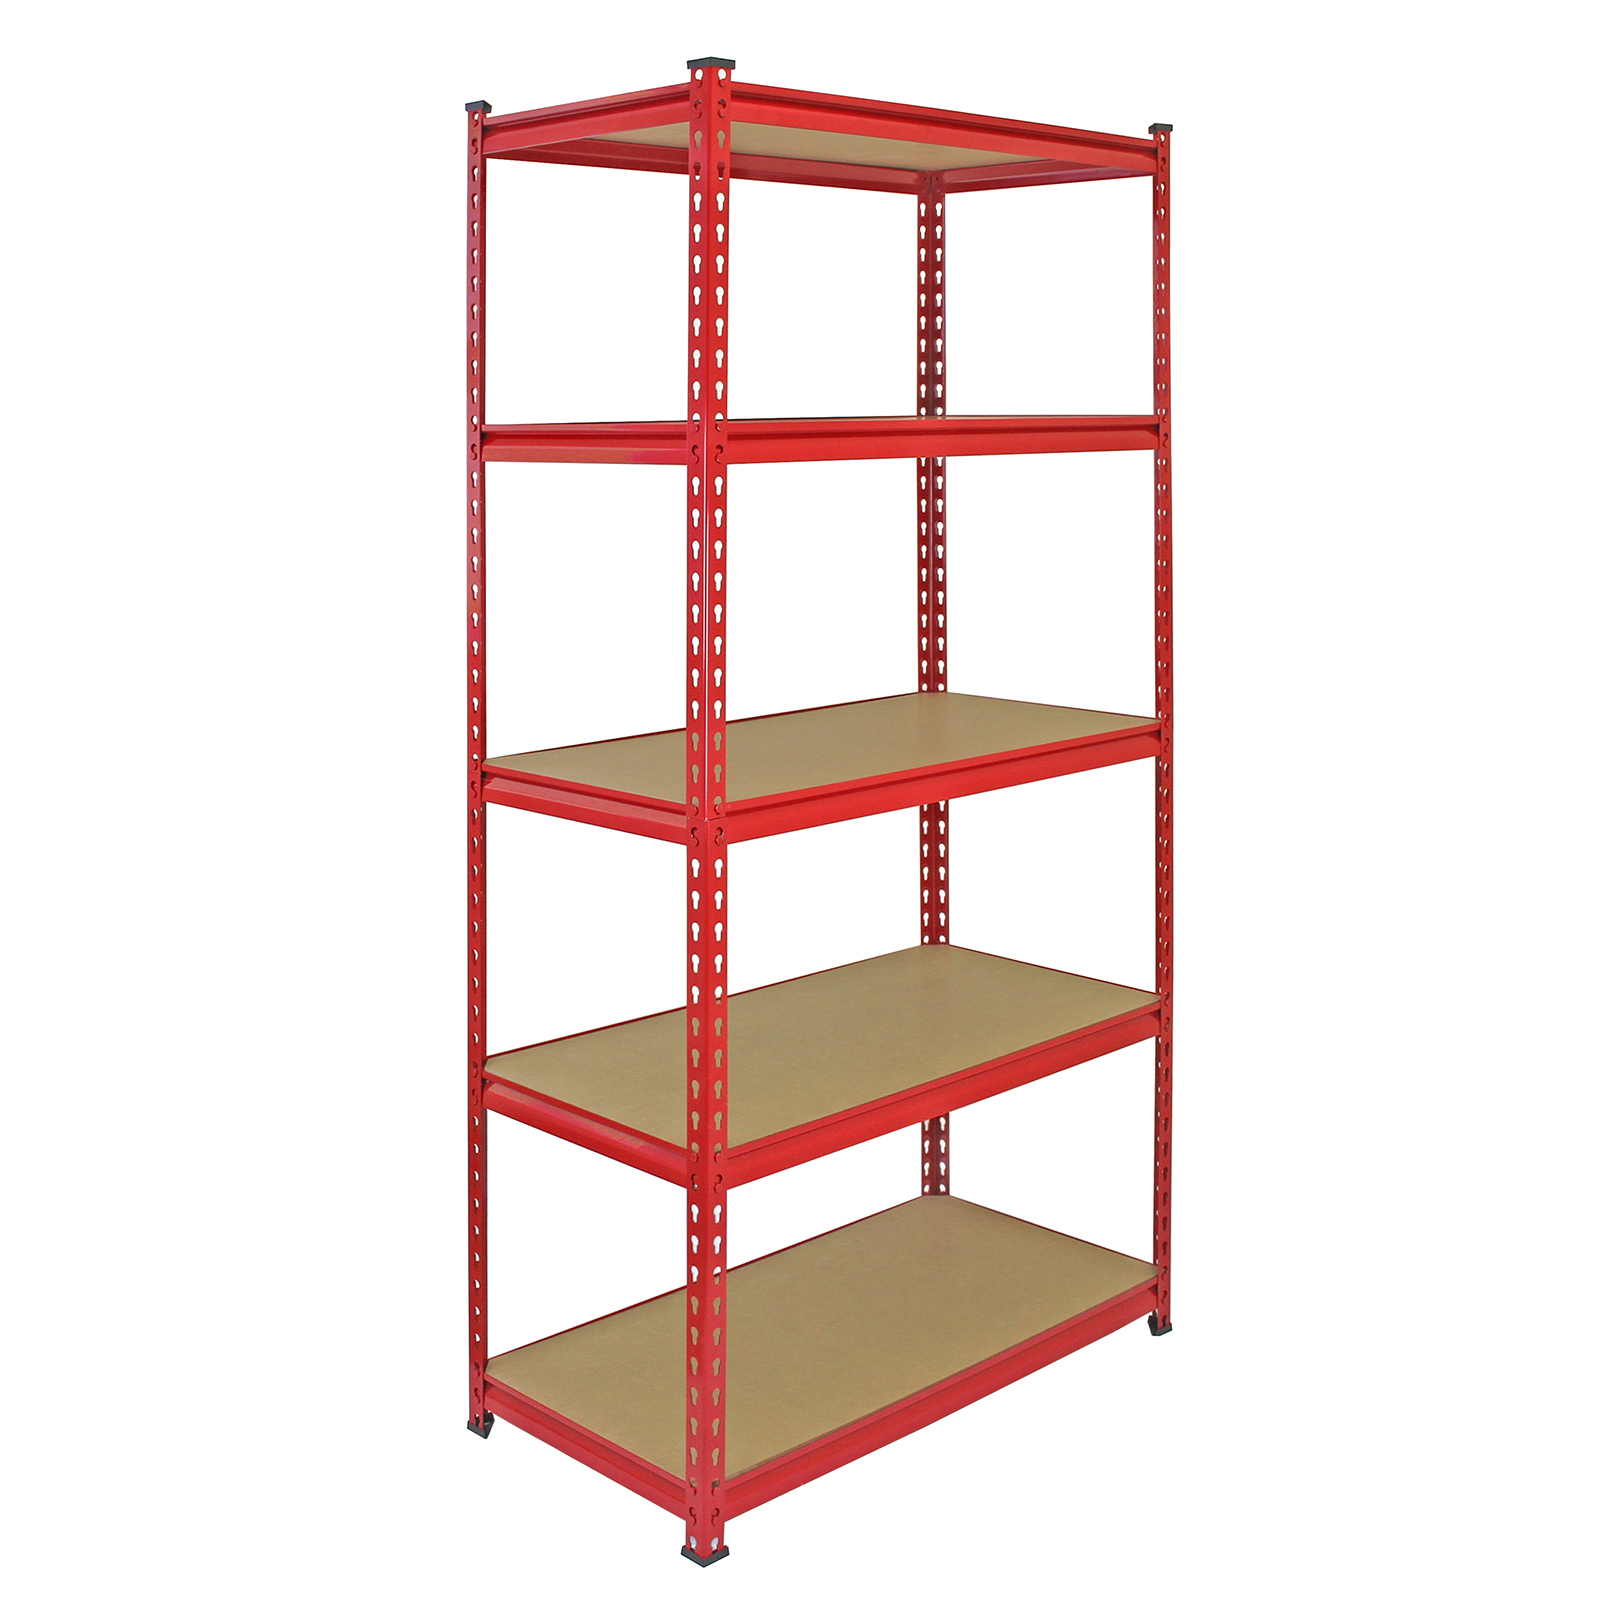 4 heavy duty shelving racking garage 5 tier storage units. Black Bedroom Furniture Sets. Home Design Ideas